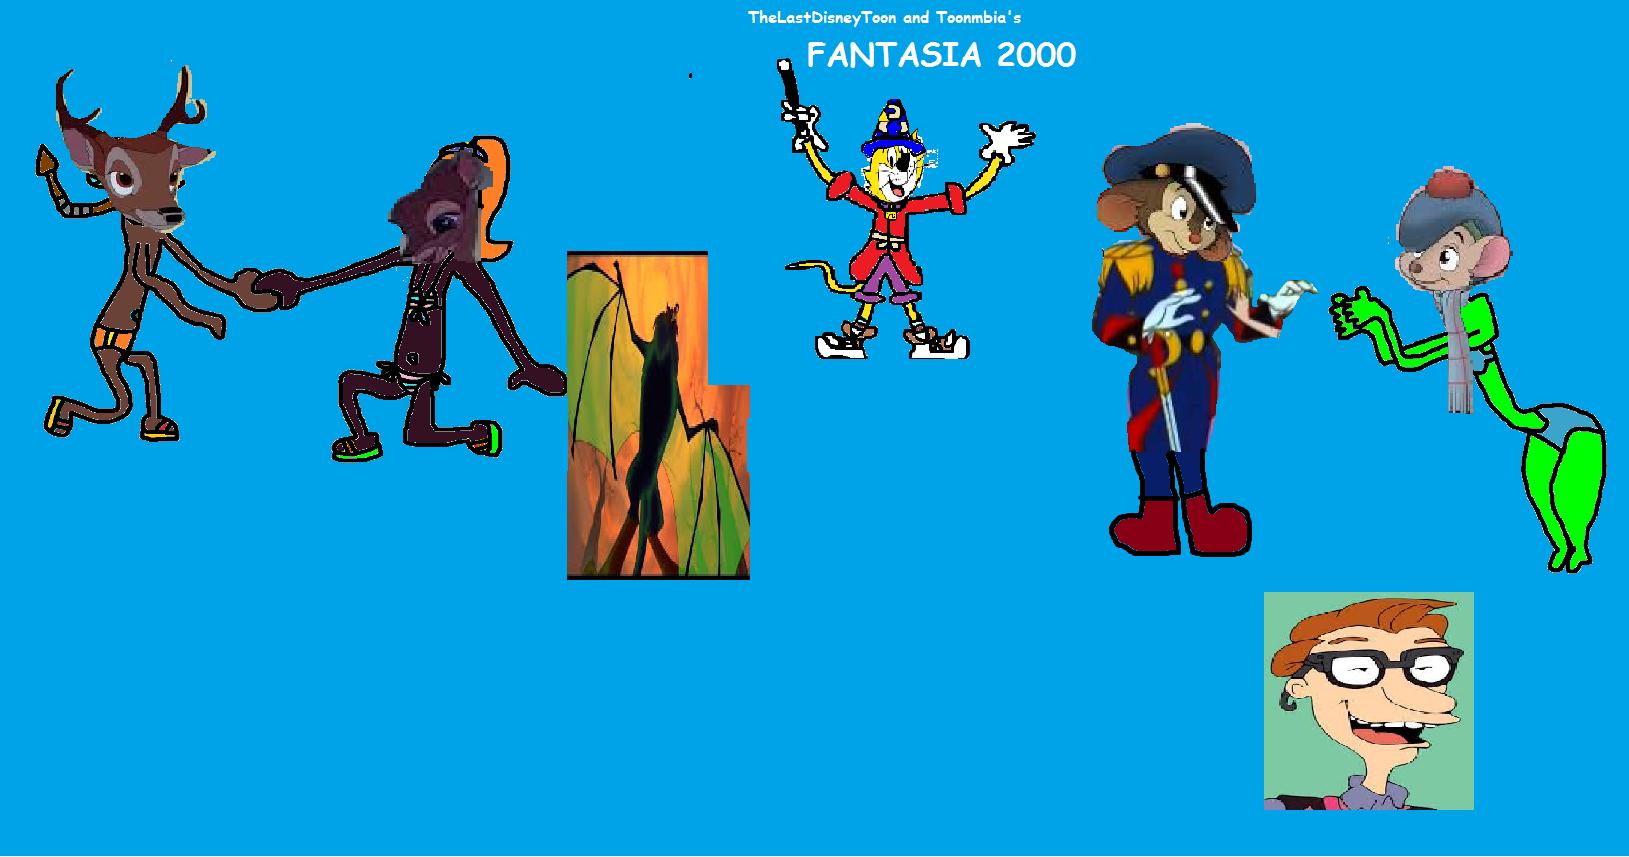 Fantasia 2000 (TheLastDisneyToon and Toonmbia Style)